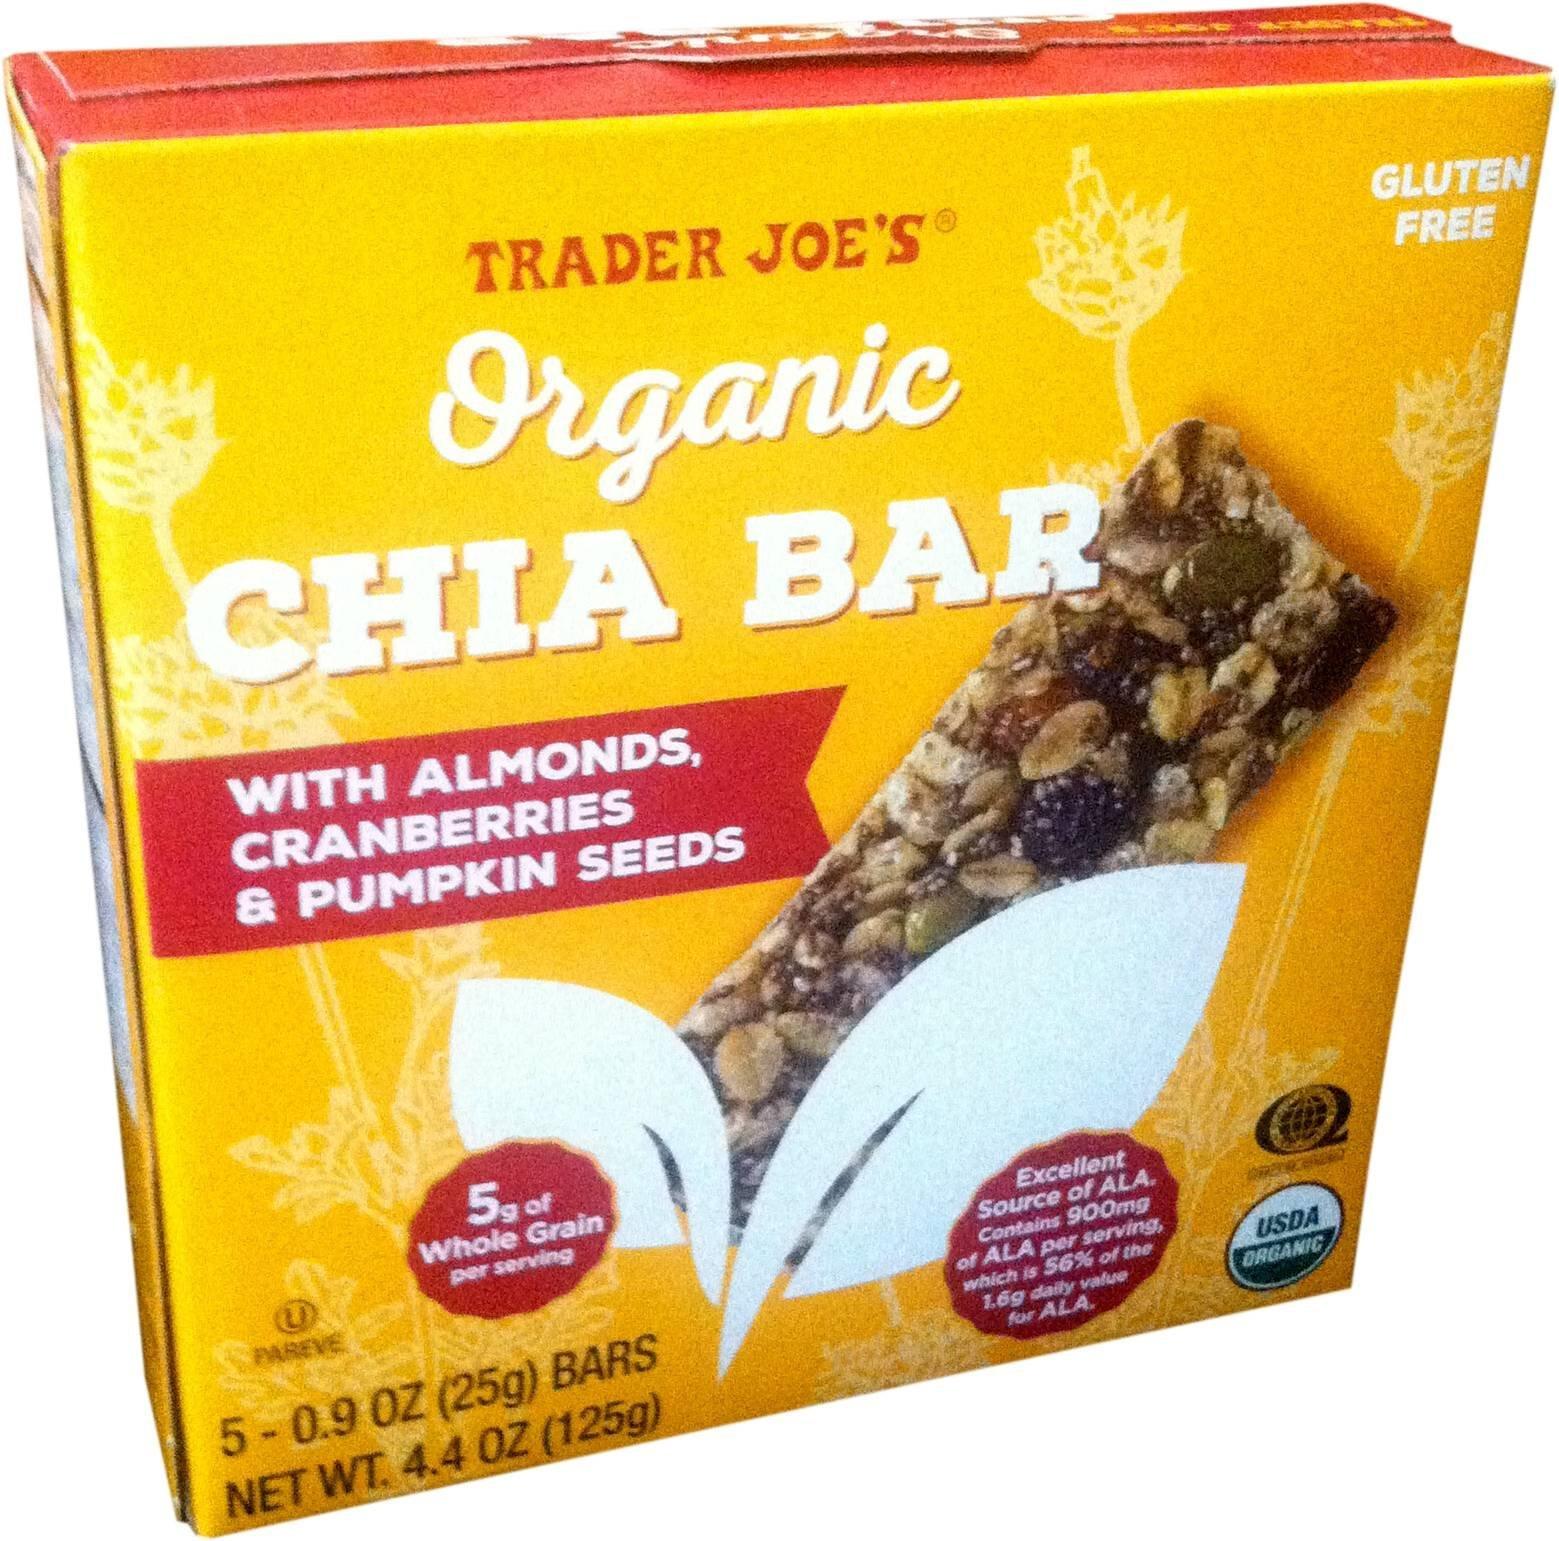 Trader Joe's Organic Chia Bars with Almonds, Cranberries, & Pumpkin Seeds, 5 Bars, Net Wt. 4.4 oz